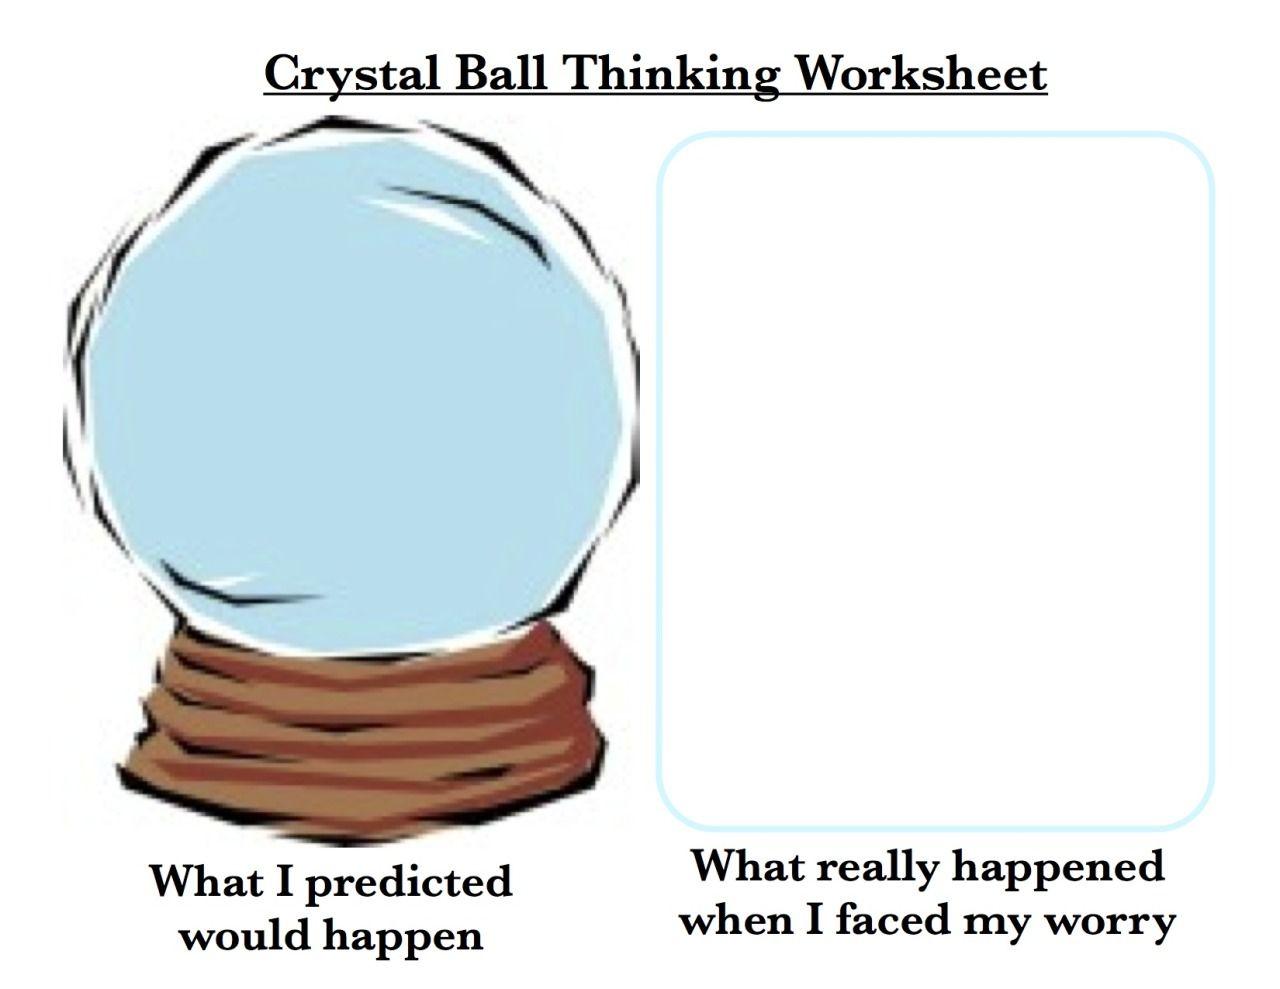 Crystal Ball Thinking Worksheet